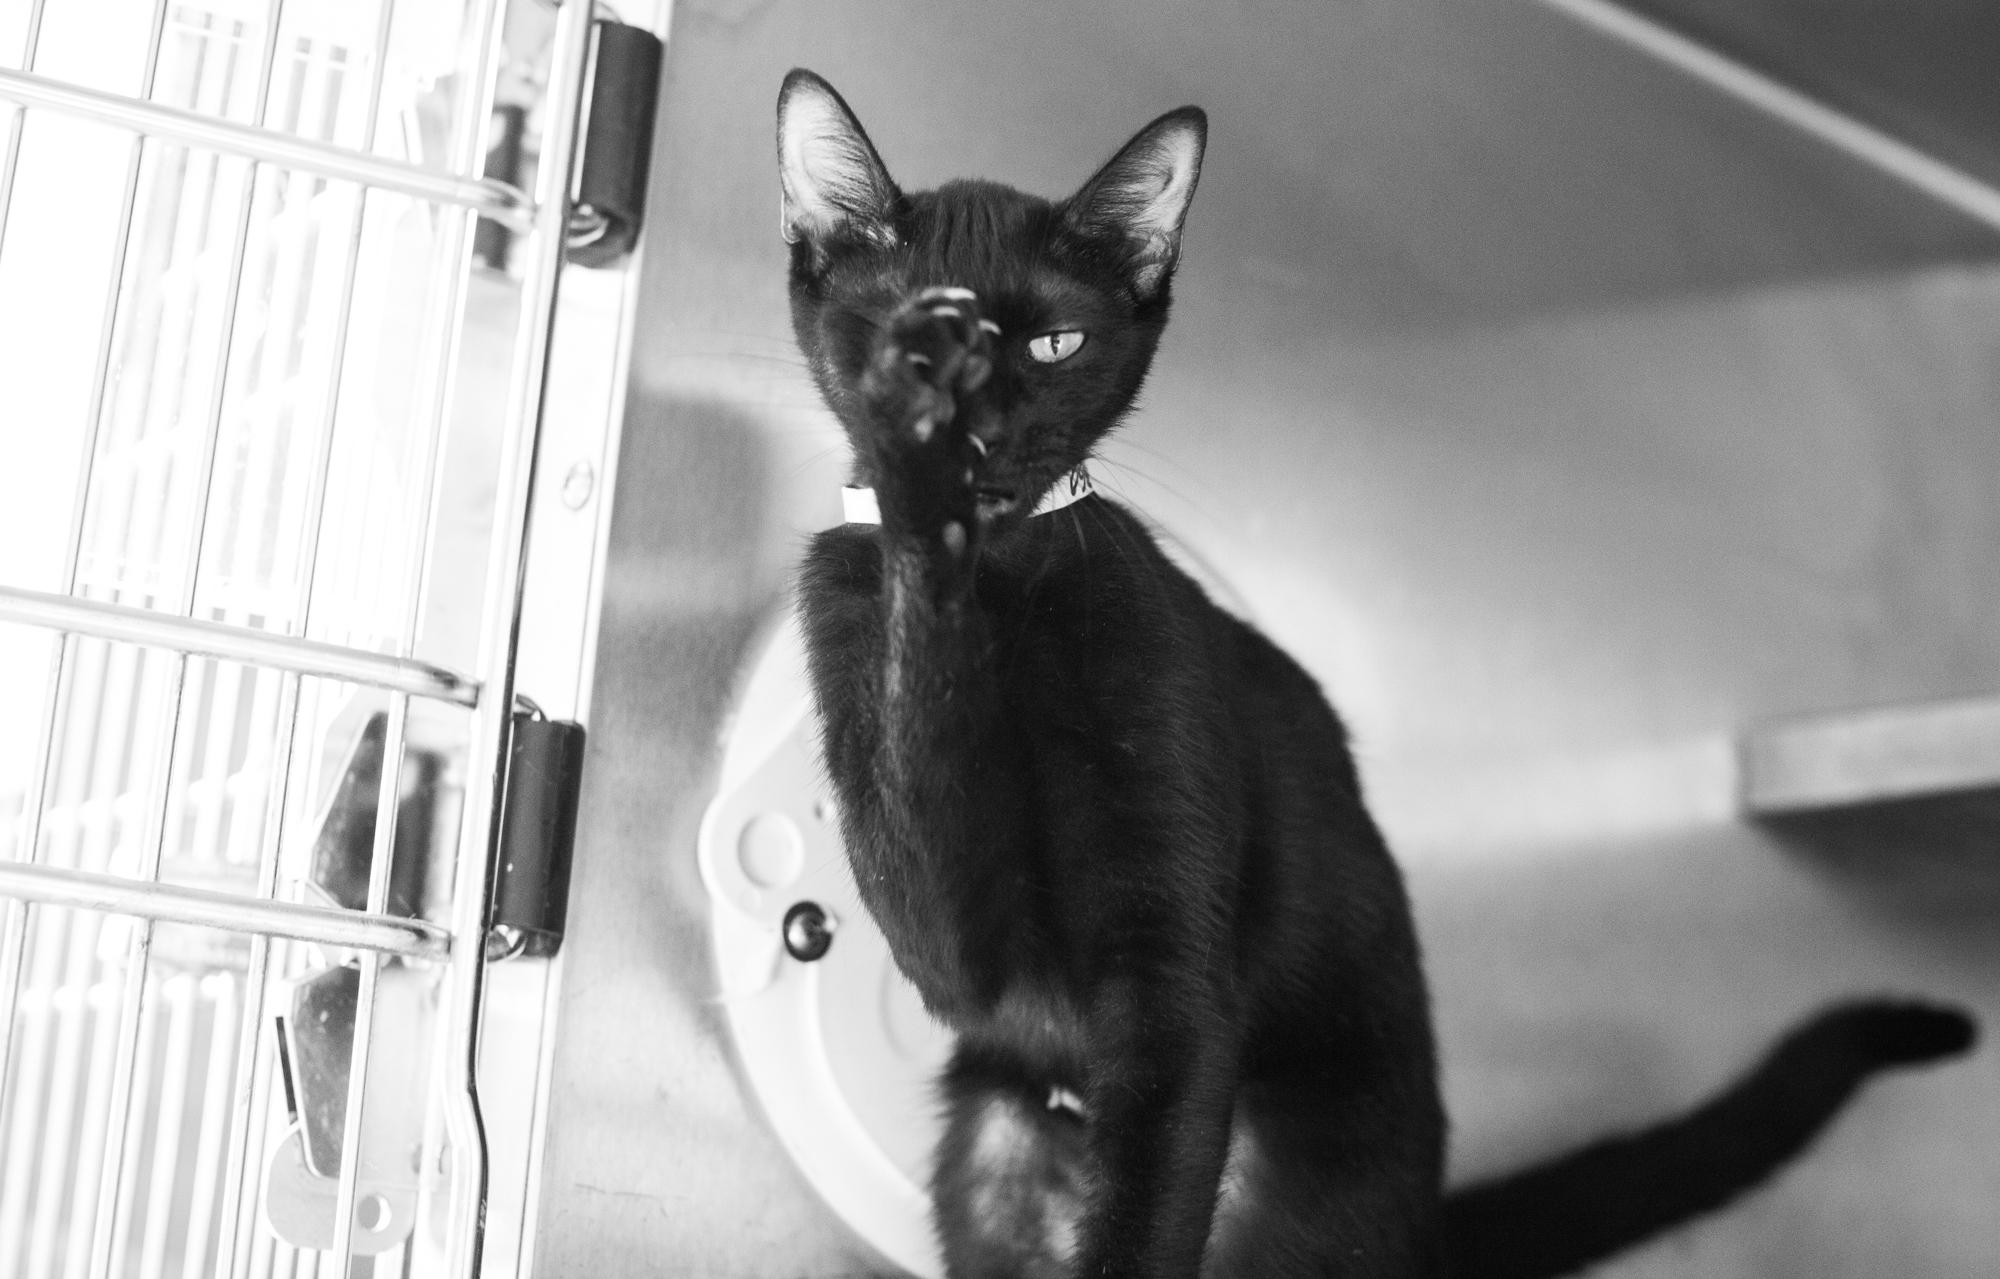 058_animal-photography-cats-dogs-volunteer_MG_8820.jpg